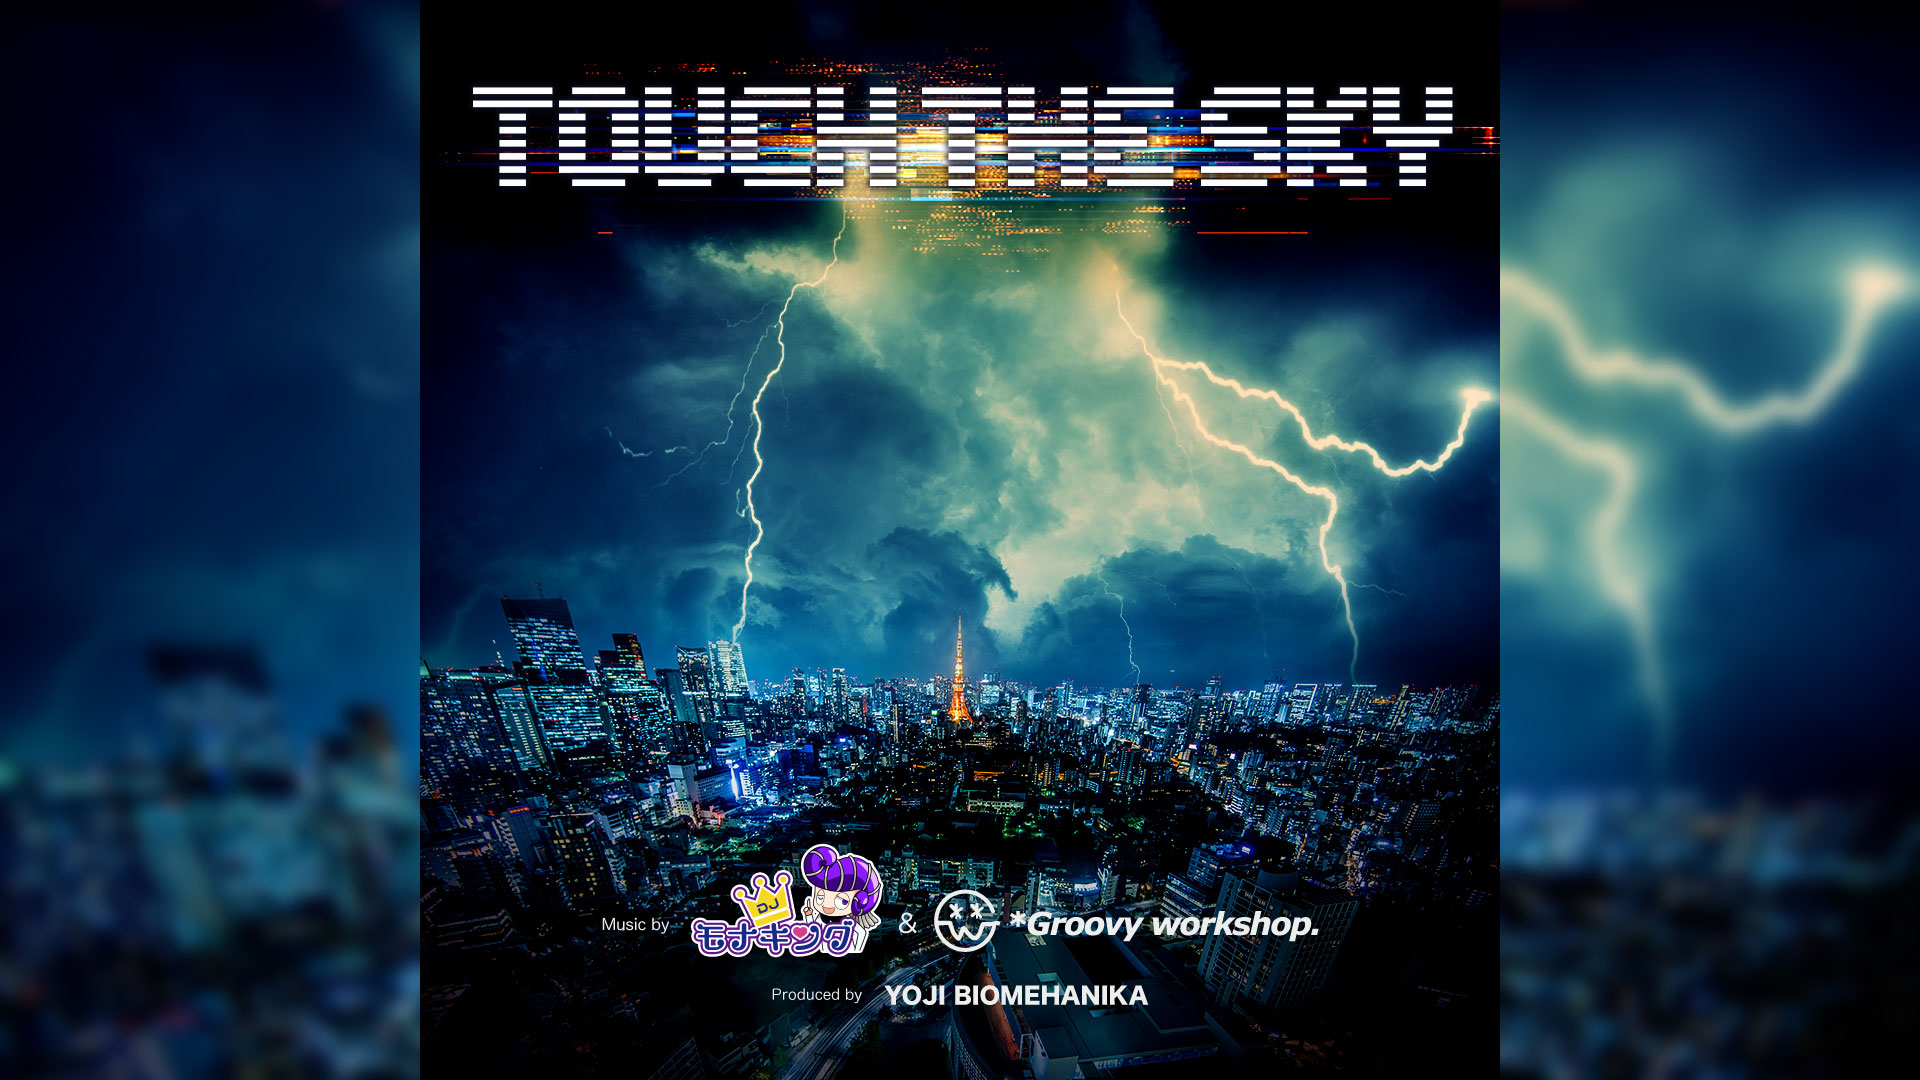 『TOUCH THE SKY』が早くもiTunesダンスチャート1位を獲得!!